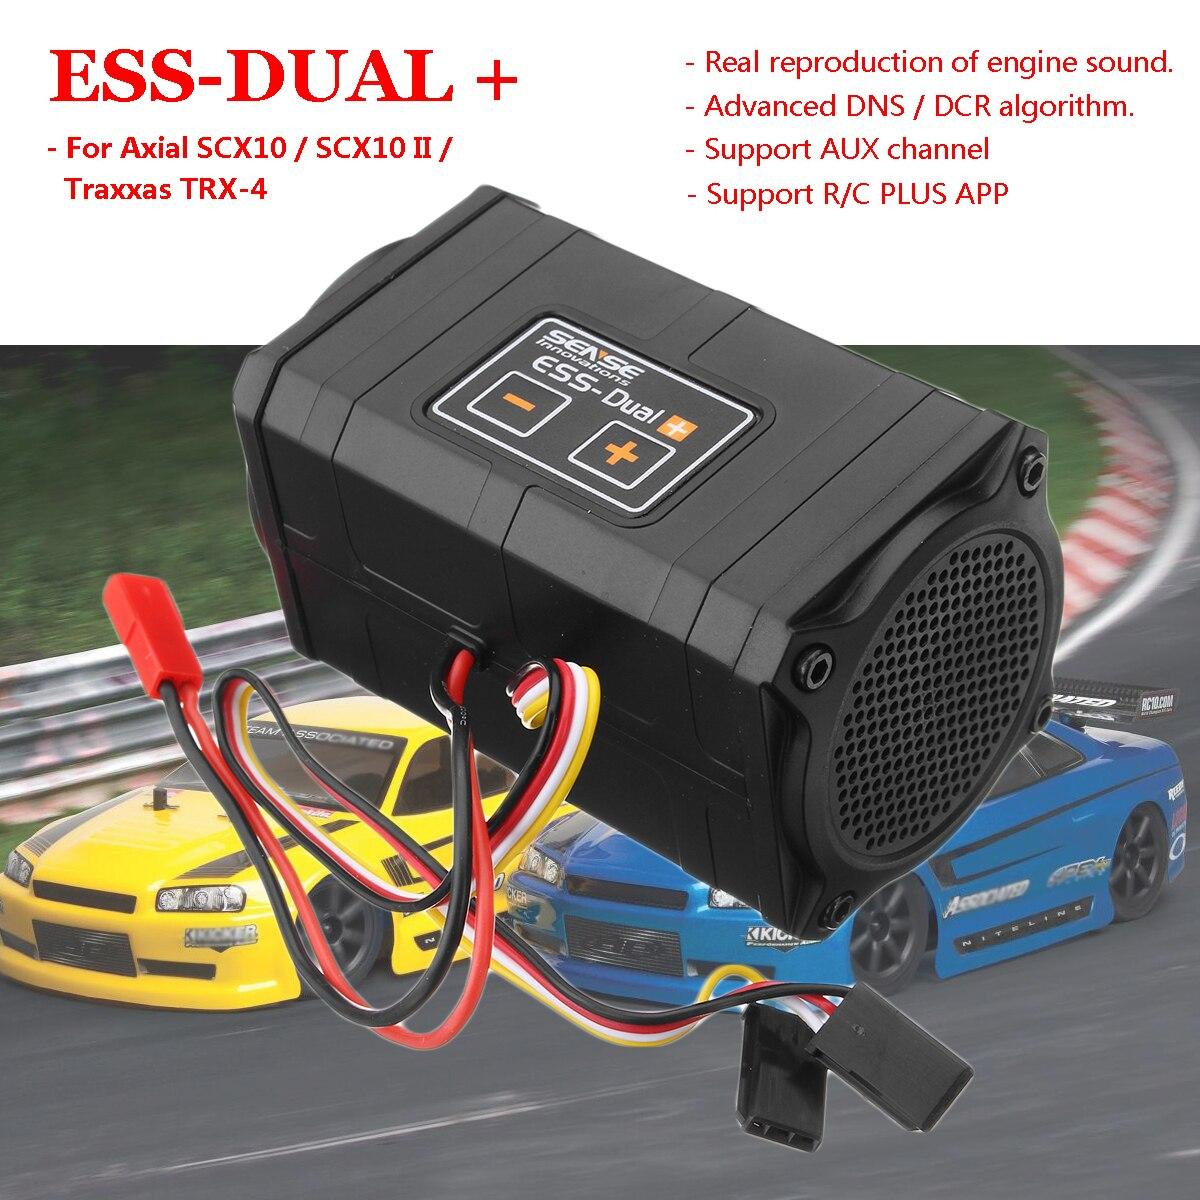 For Axial SCX10 II TRX-4 Parts & Accs Sense Innovations DUAL Plus Engine Sound Simulator RC/PLUS App Firmware Upgrade new dual speakers sense innovations ess dual engine sound system real engine sound simulator for scx10 trx 4 crawler rc car